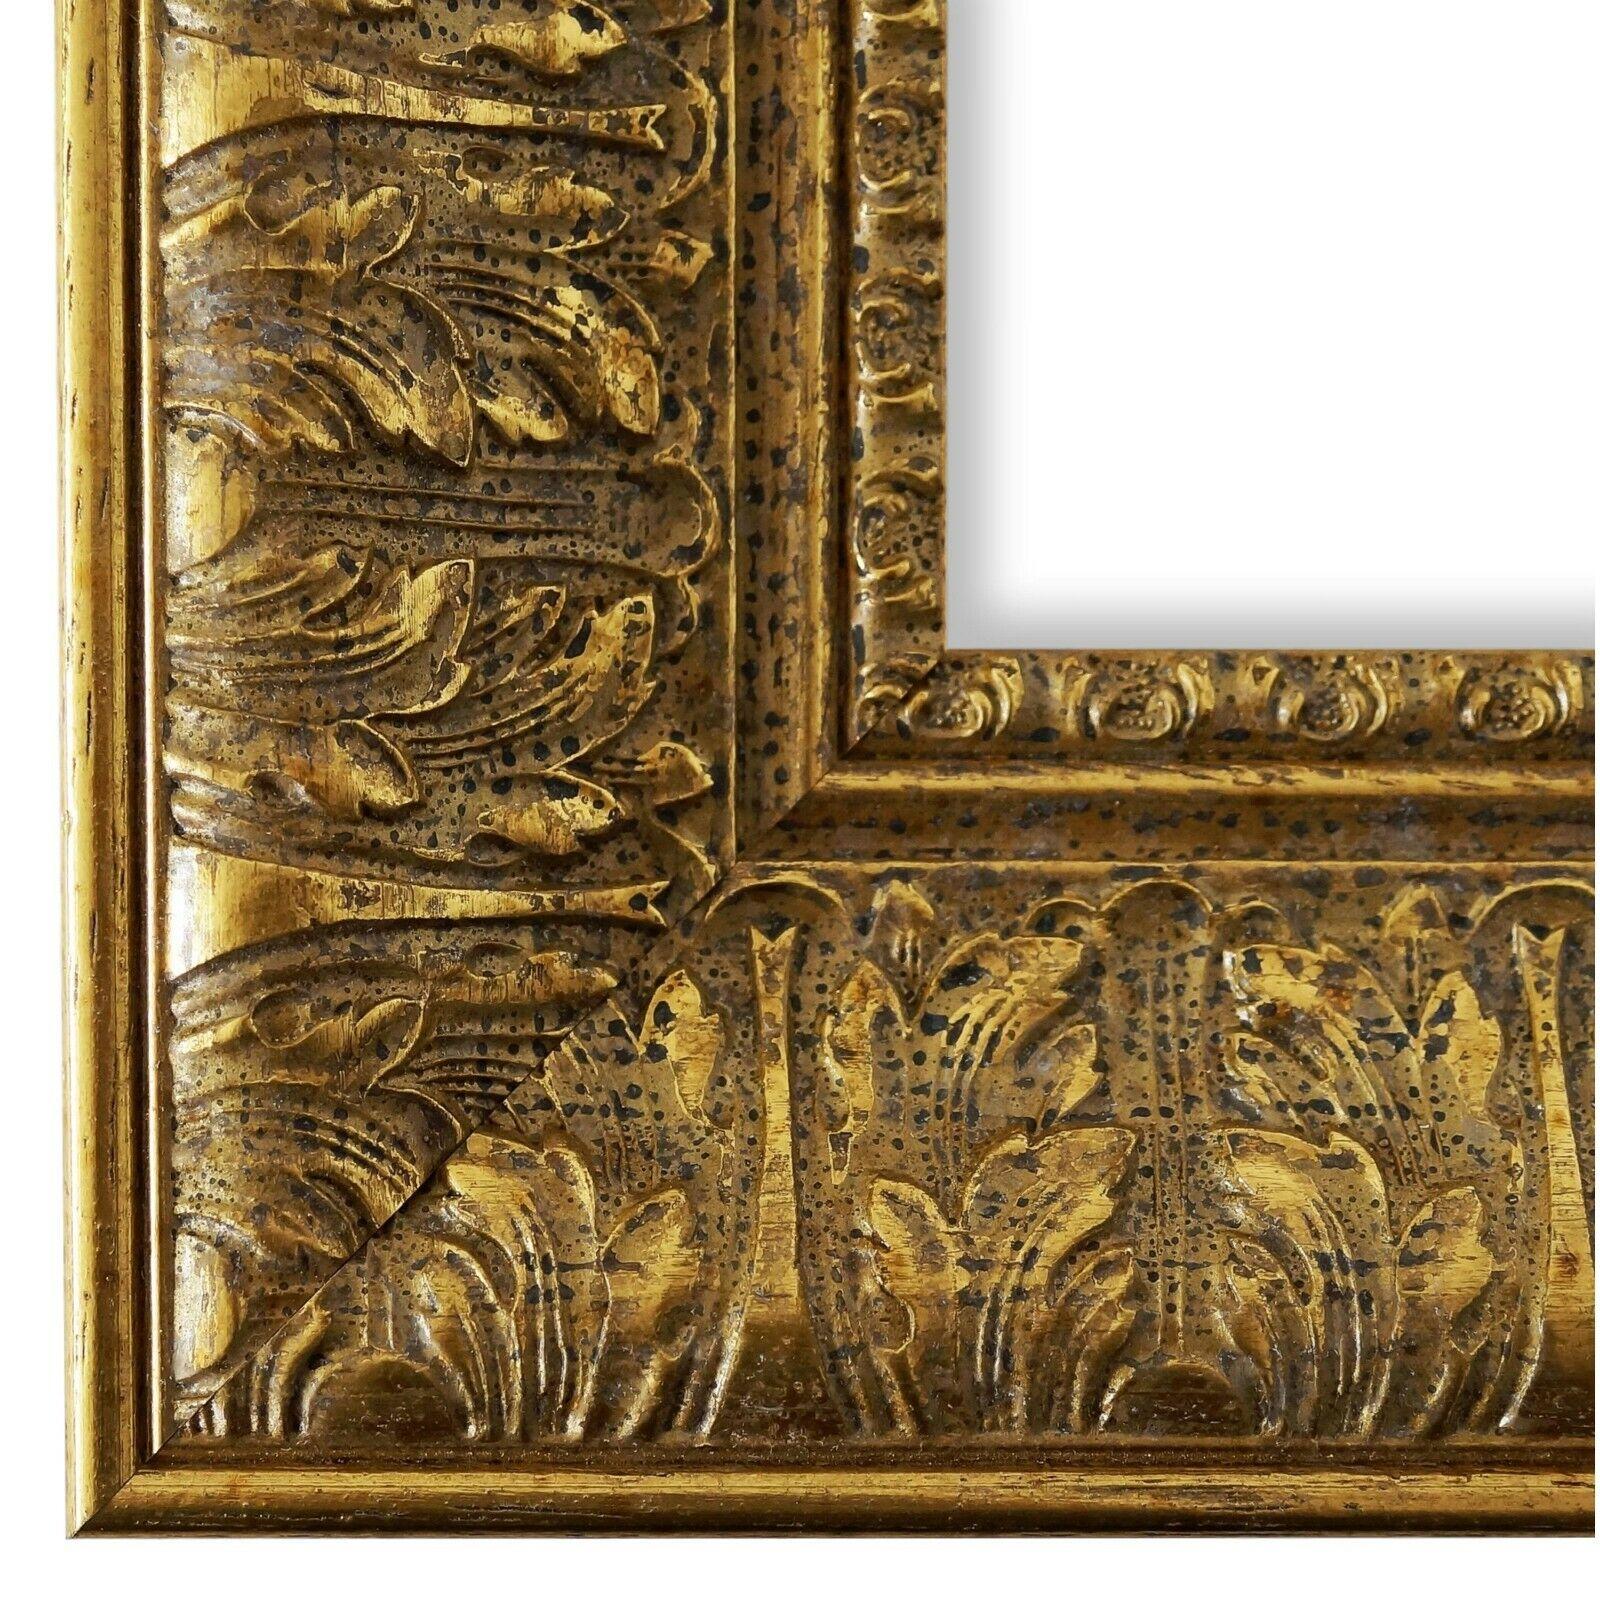 Bilderrahmen Ancona Gold - 24x30 28x35 30x30 30x40 30x45 40x40 40x50